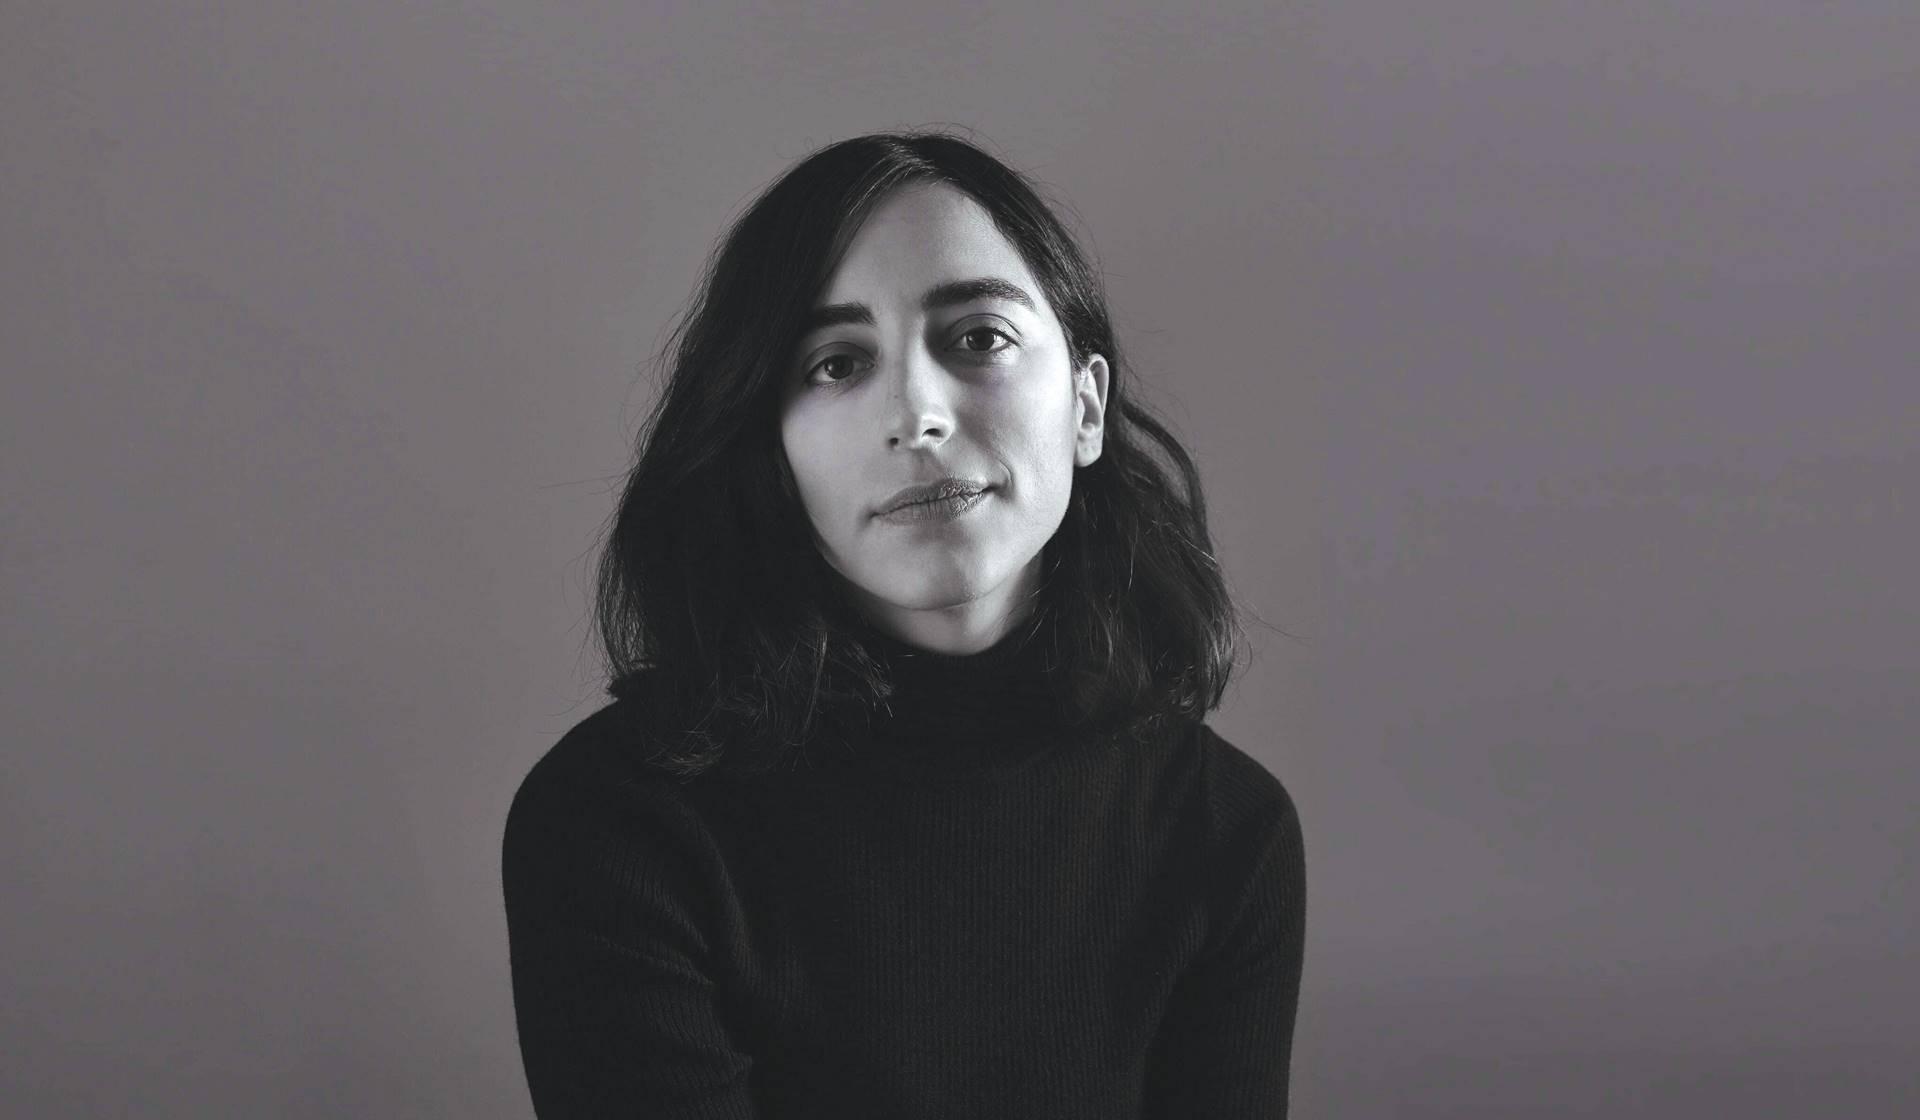 La novela de Anagrama 'La Extranjera' de Claudia Durastanti